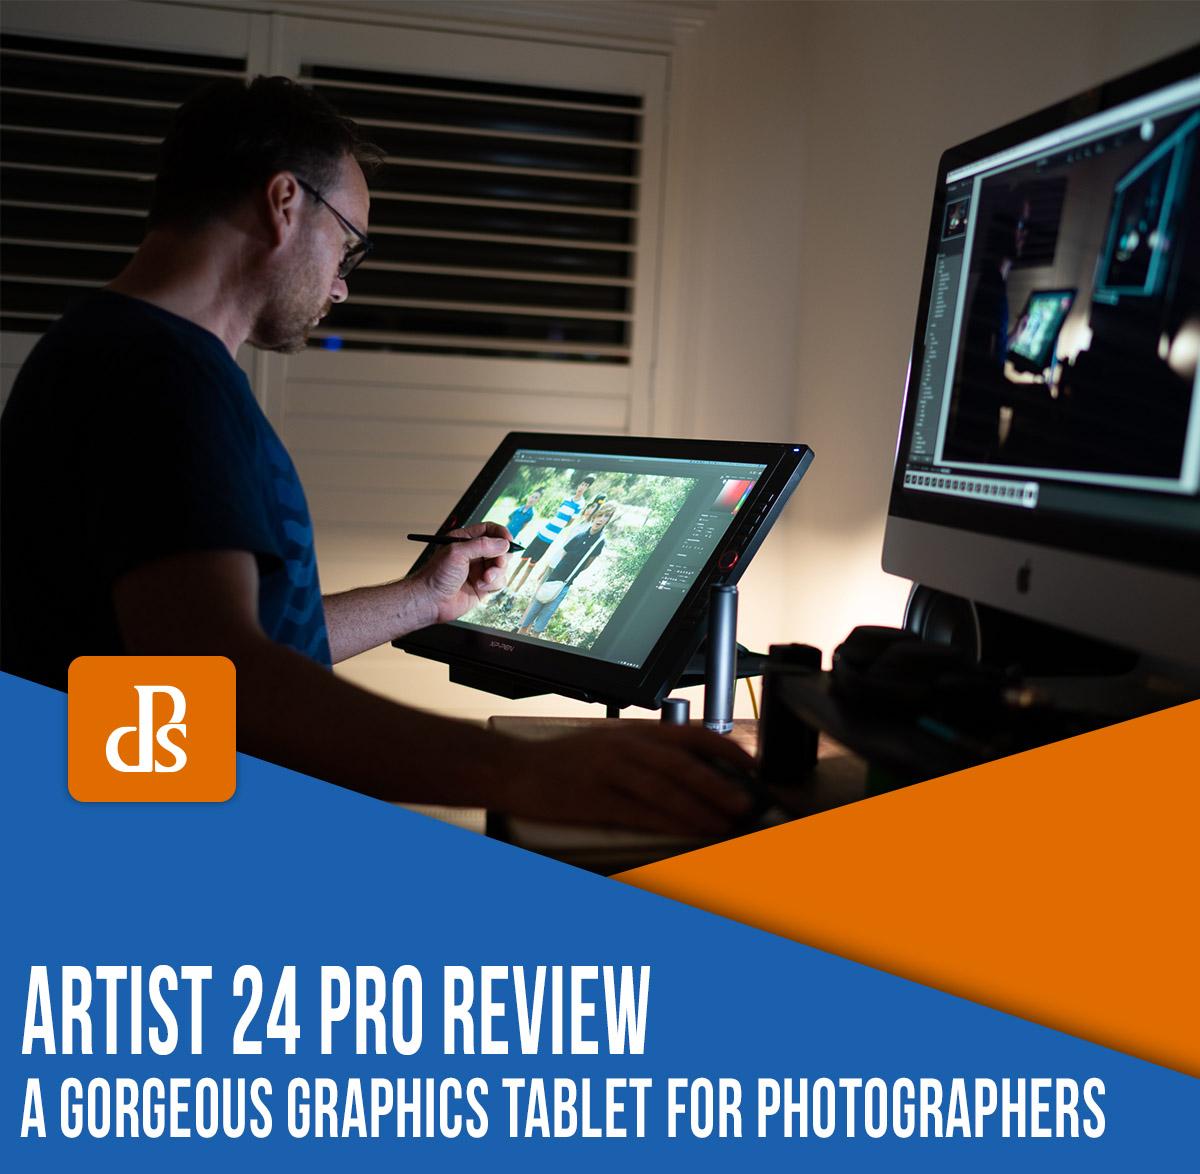 https://i0.wp.com/digital-photography-school.com/wp-content/uploads/2020/12/xp-pen-artist-24-pro-photography-tablet-review-100.jpg?resize=1200%2C1174&ssl=1